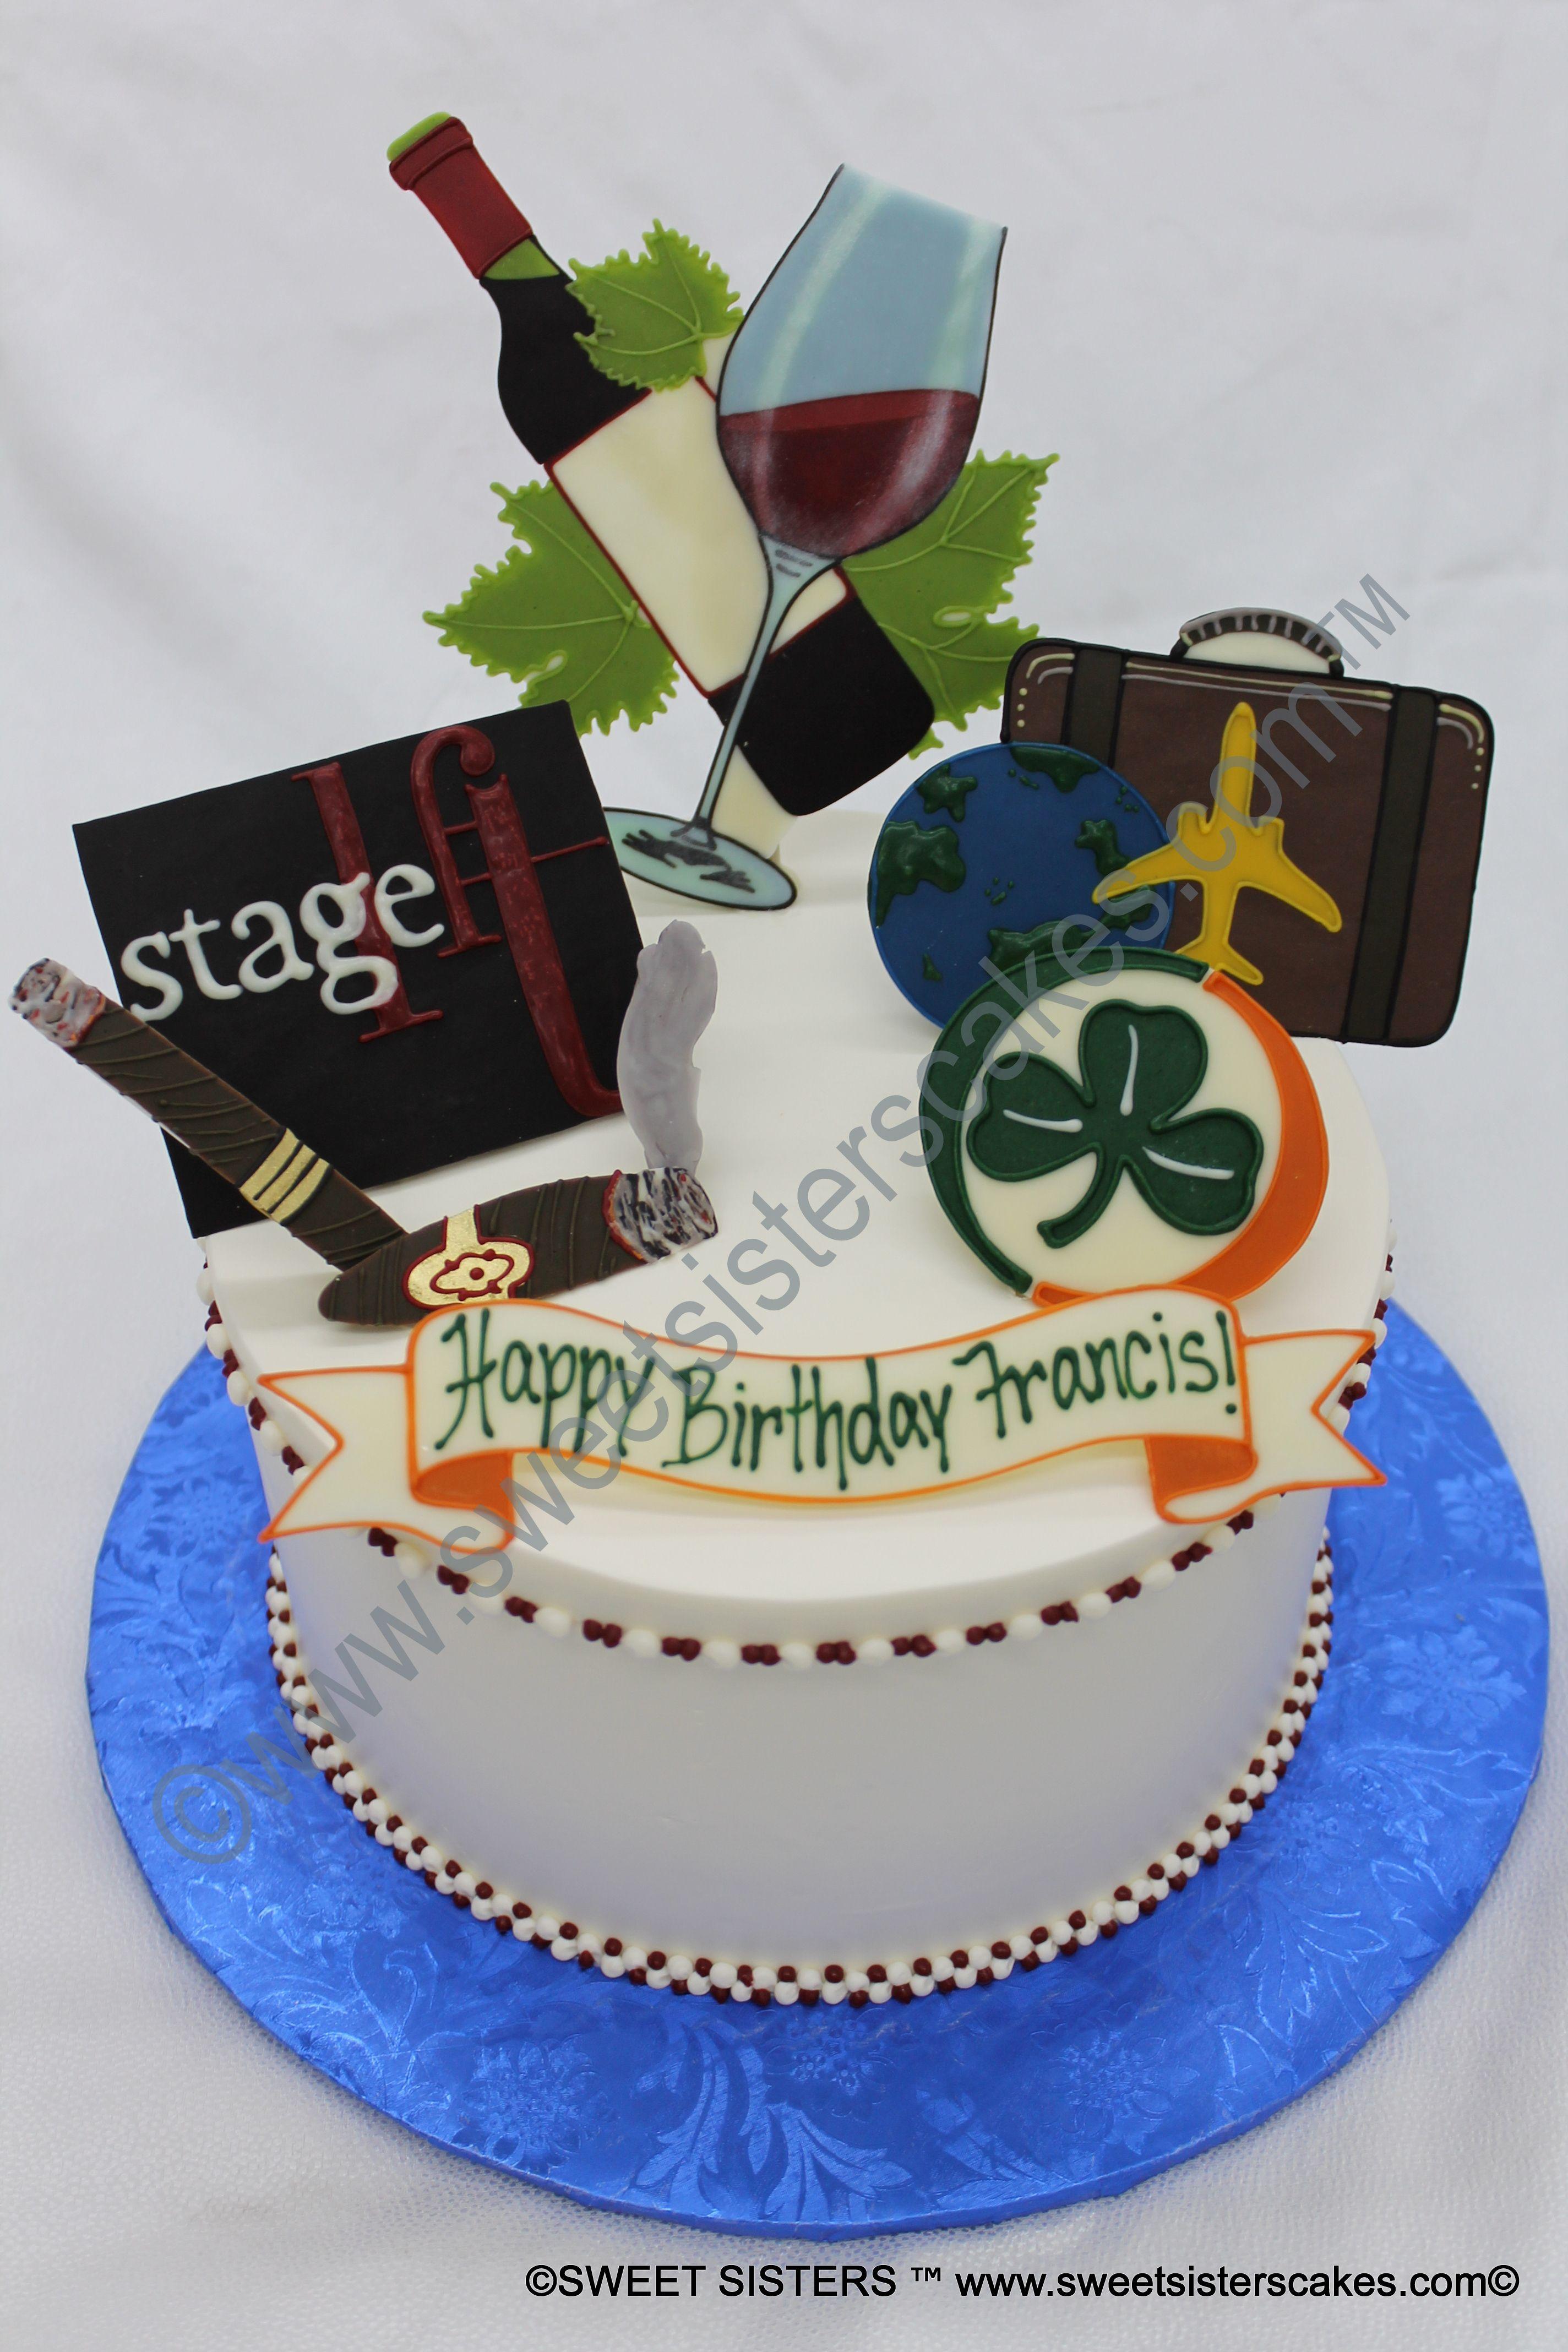 For Your Favorite Wine Drinker Desserts Cakes Glass Birthday Birthdaycake SweetSisters